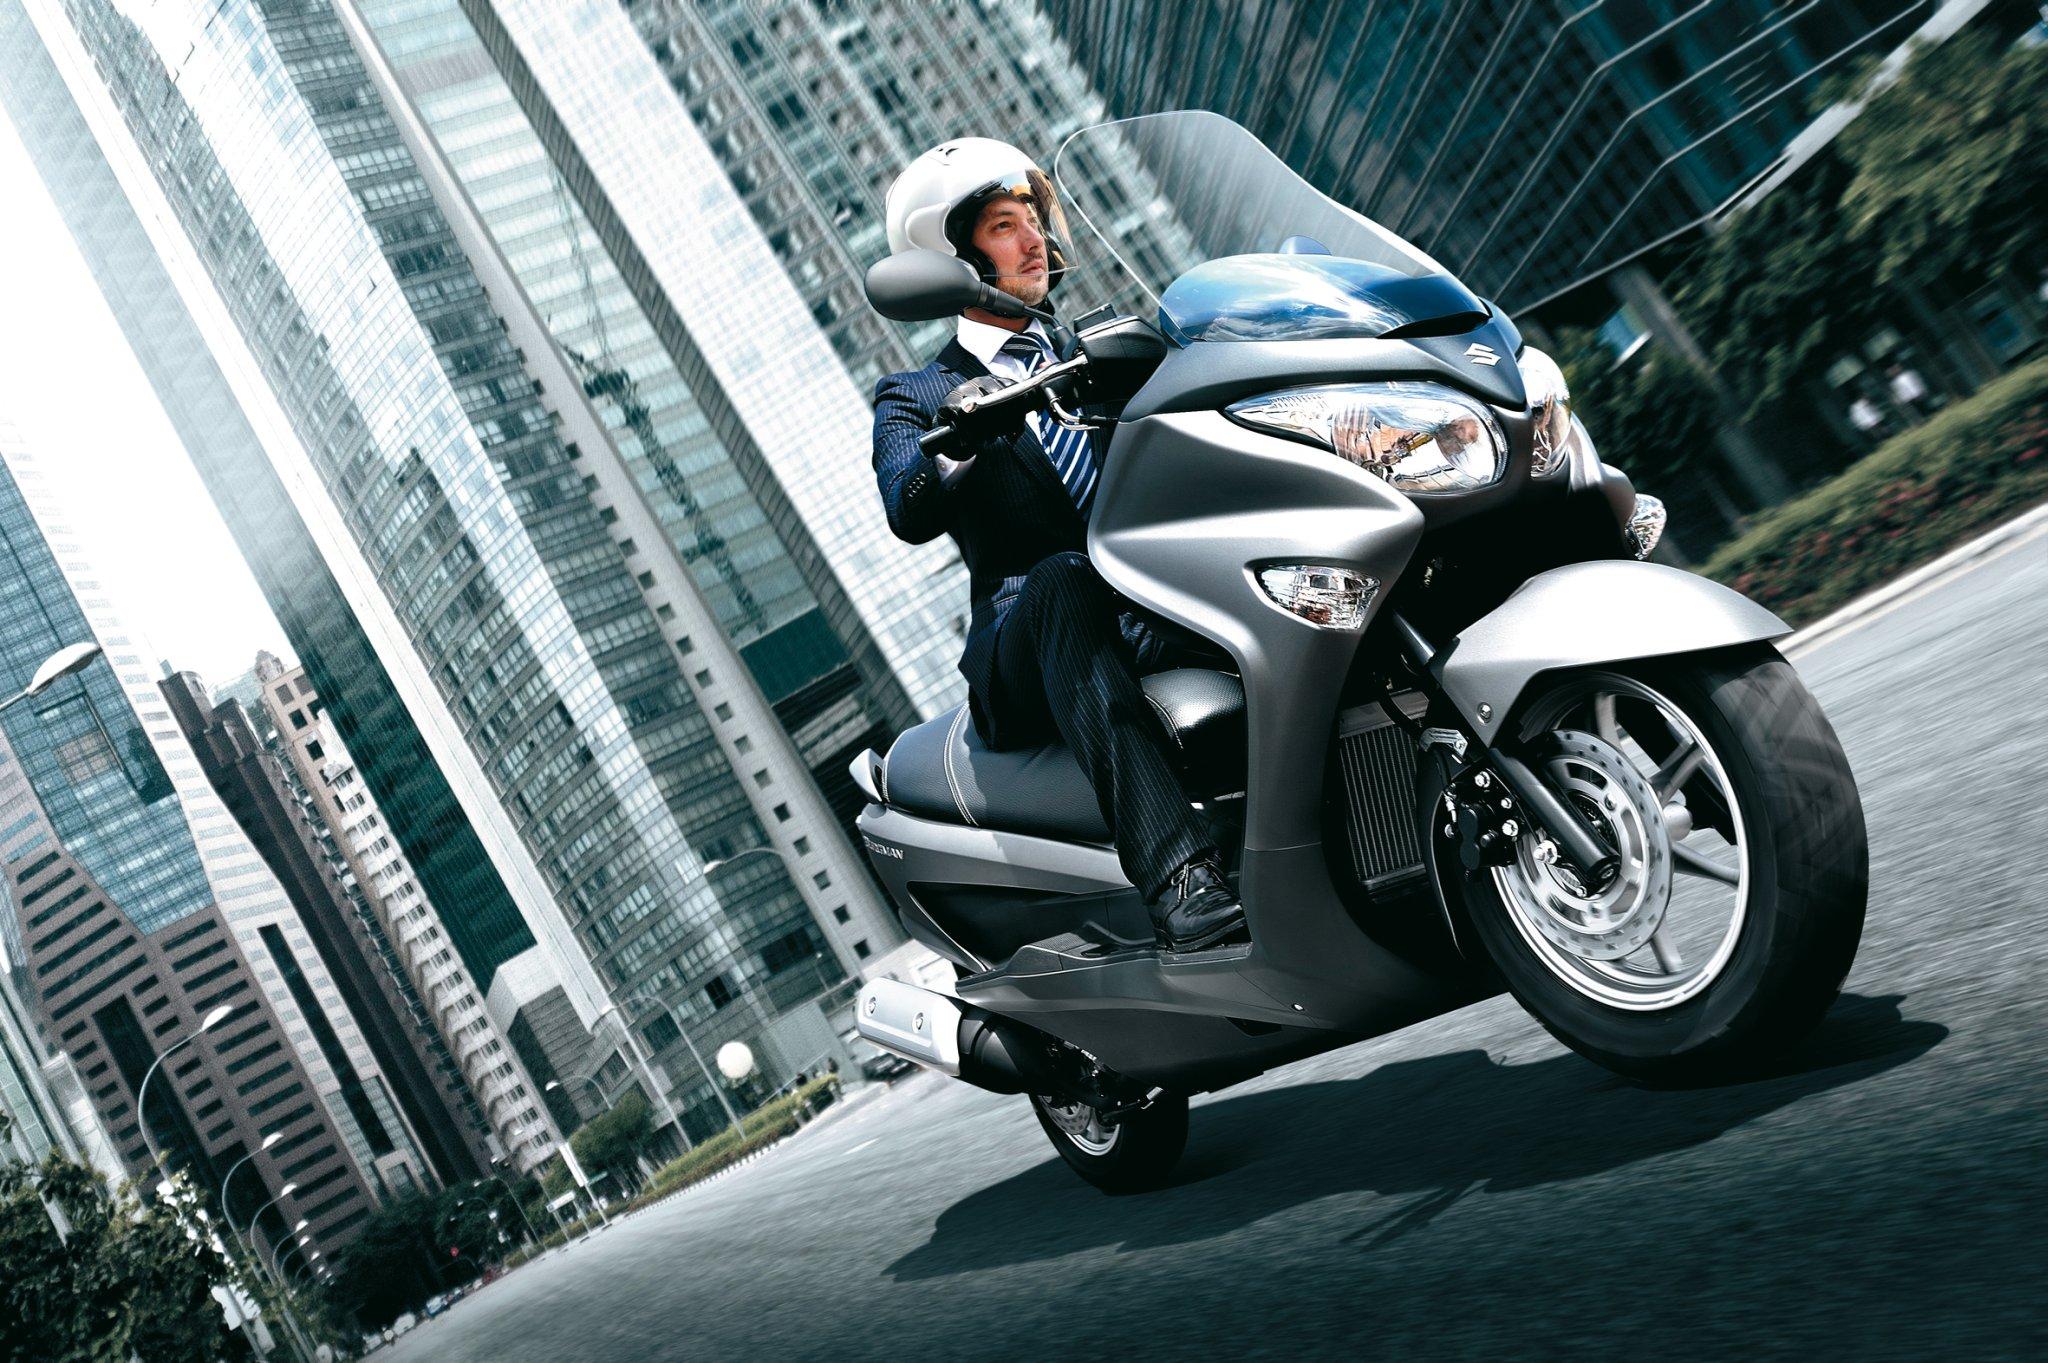 suzuki roller motorrad zweirad shop wagner 64331. Black Bedroom Furniture Sets. Home Design Ideas